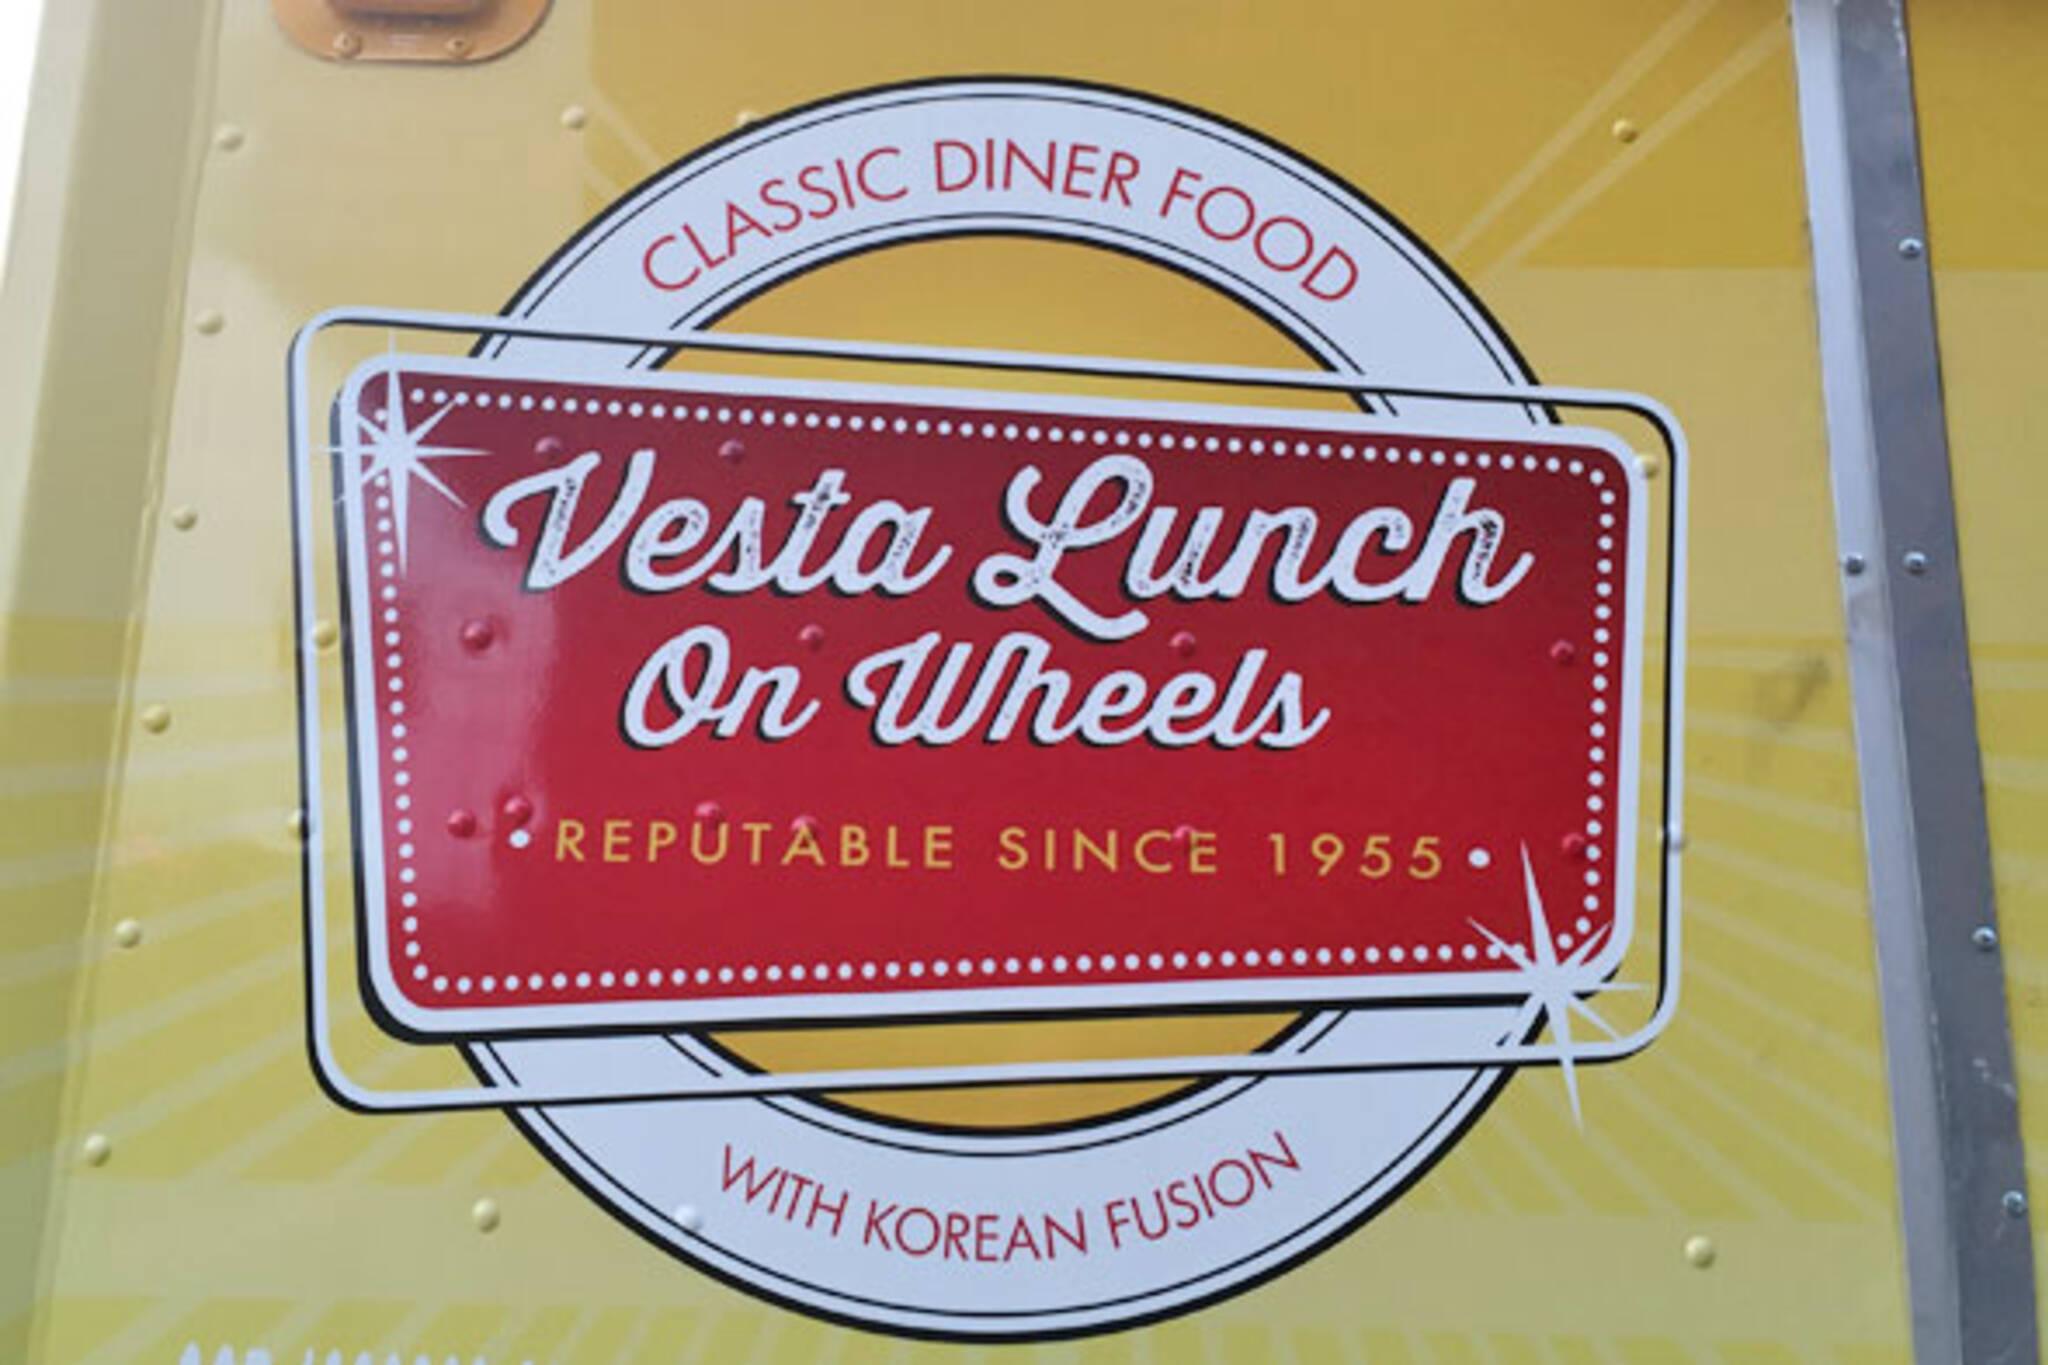 vesta lunch food truck